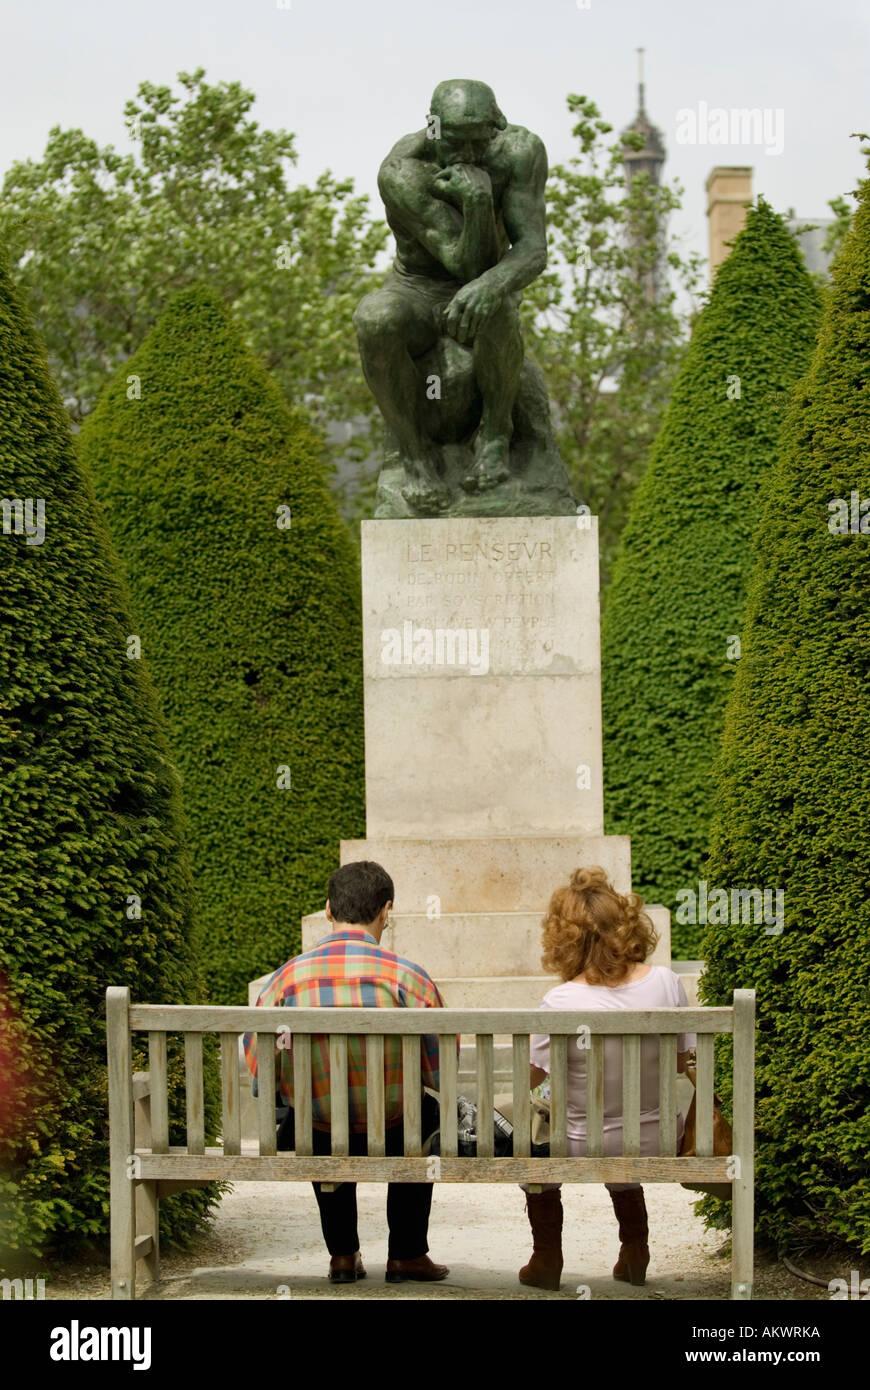 France, Paris, Rodin Museum, The Thinker - Stock Image